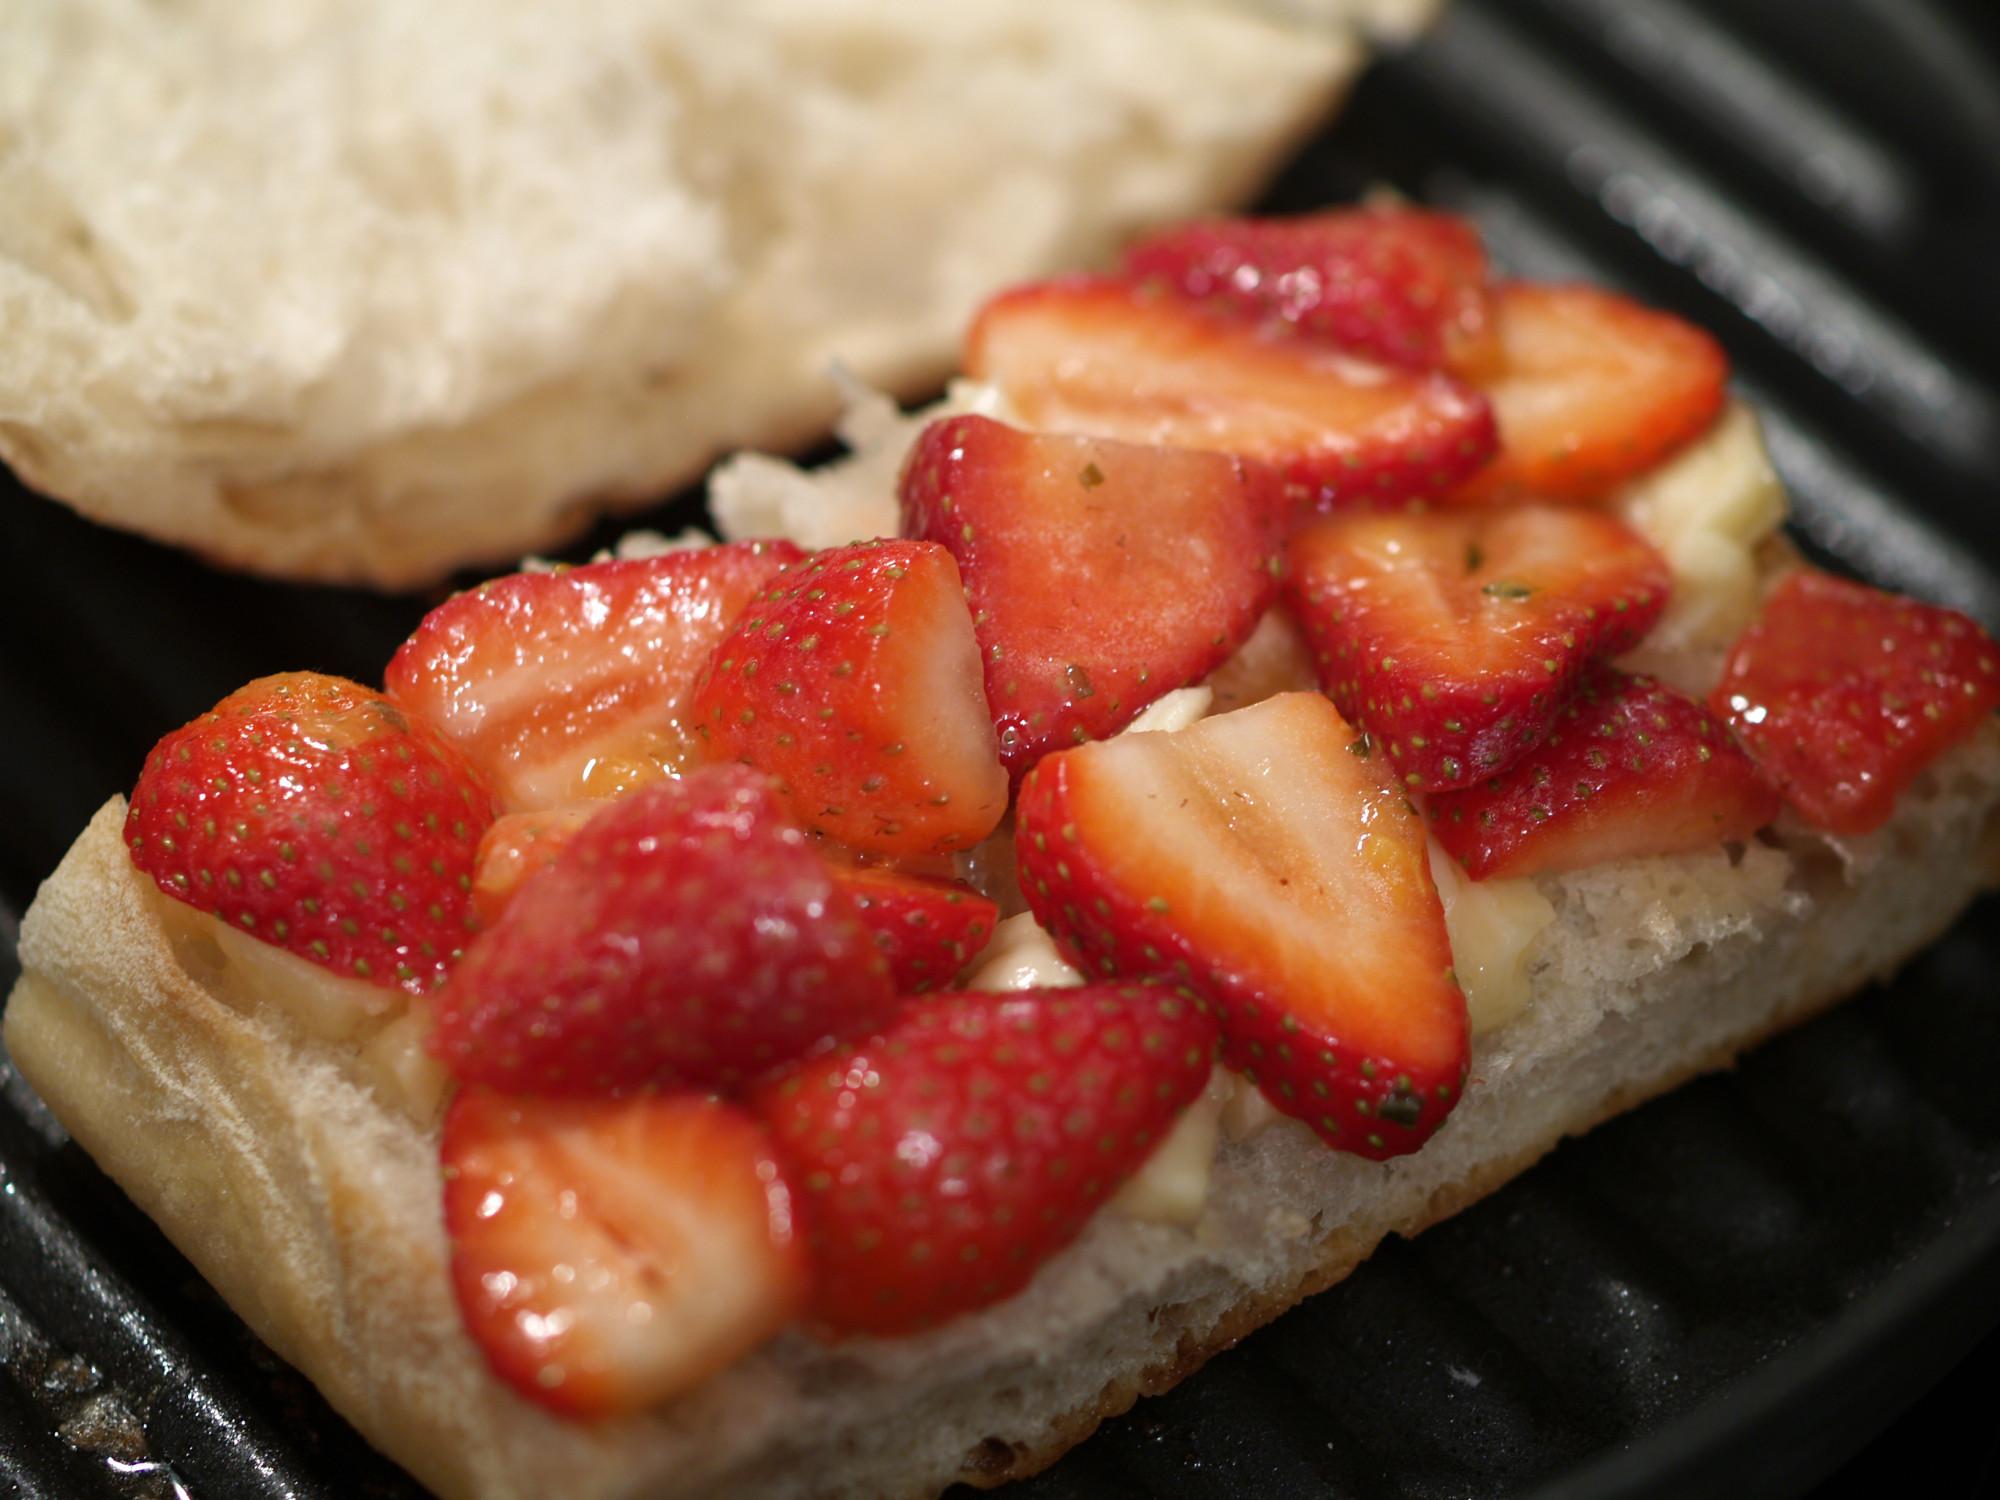 Strawberries & Orange Vinaigrette Grilled Cheese